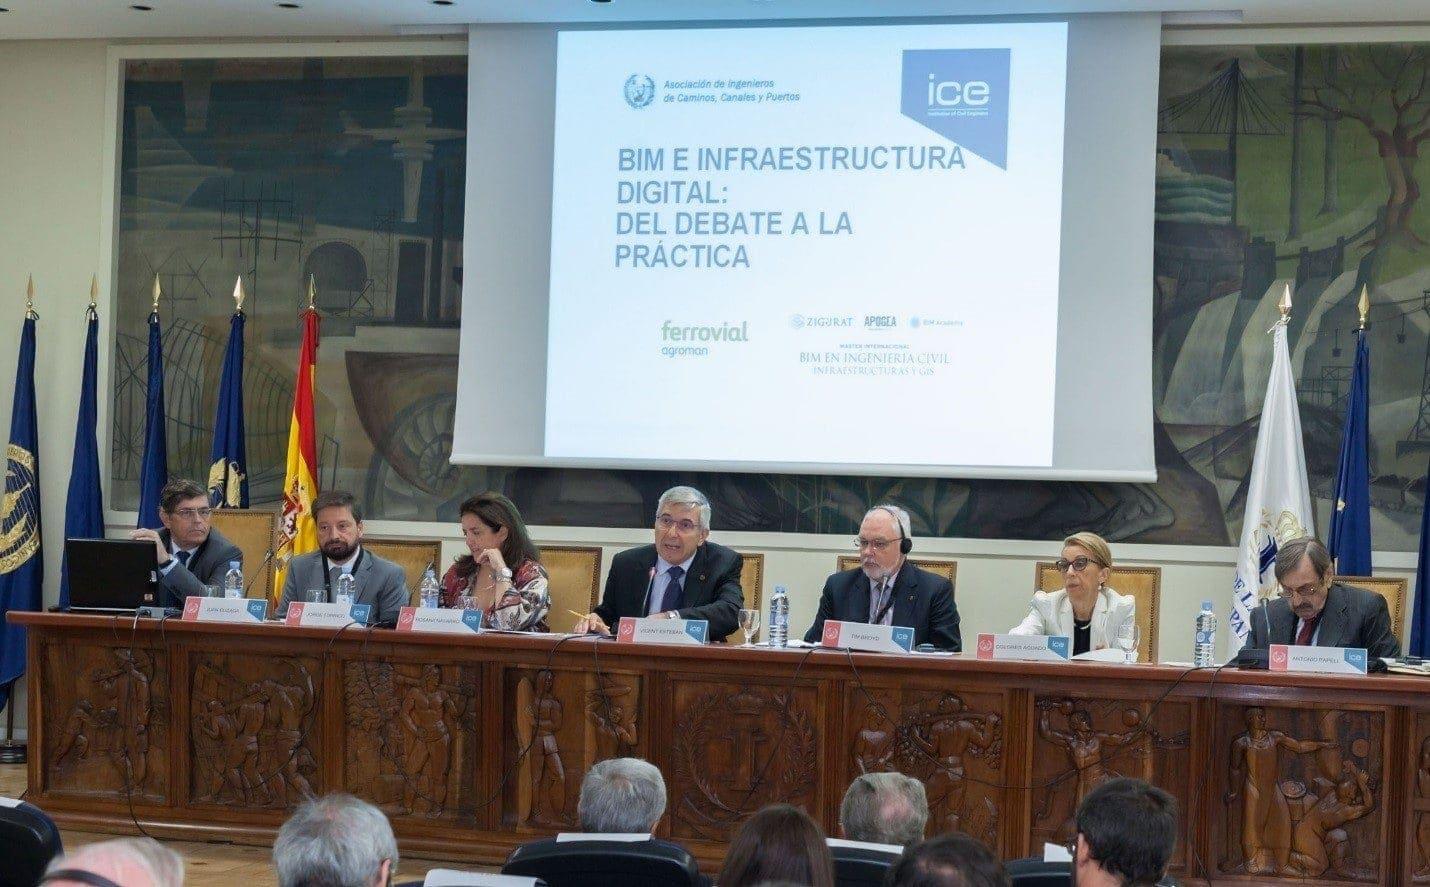 digitalisation and bim in construction